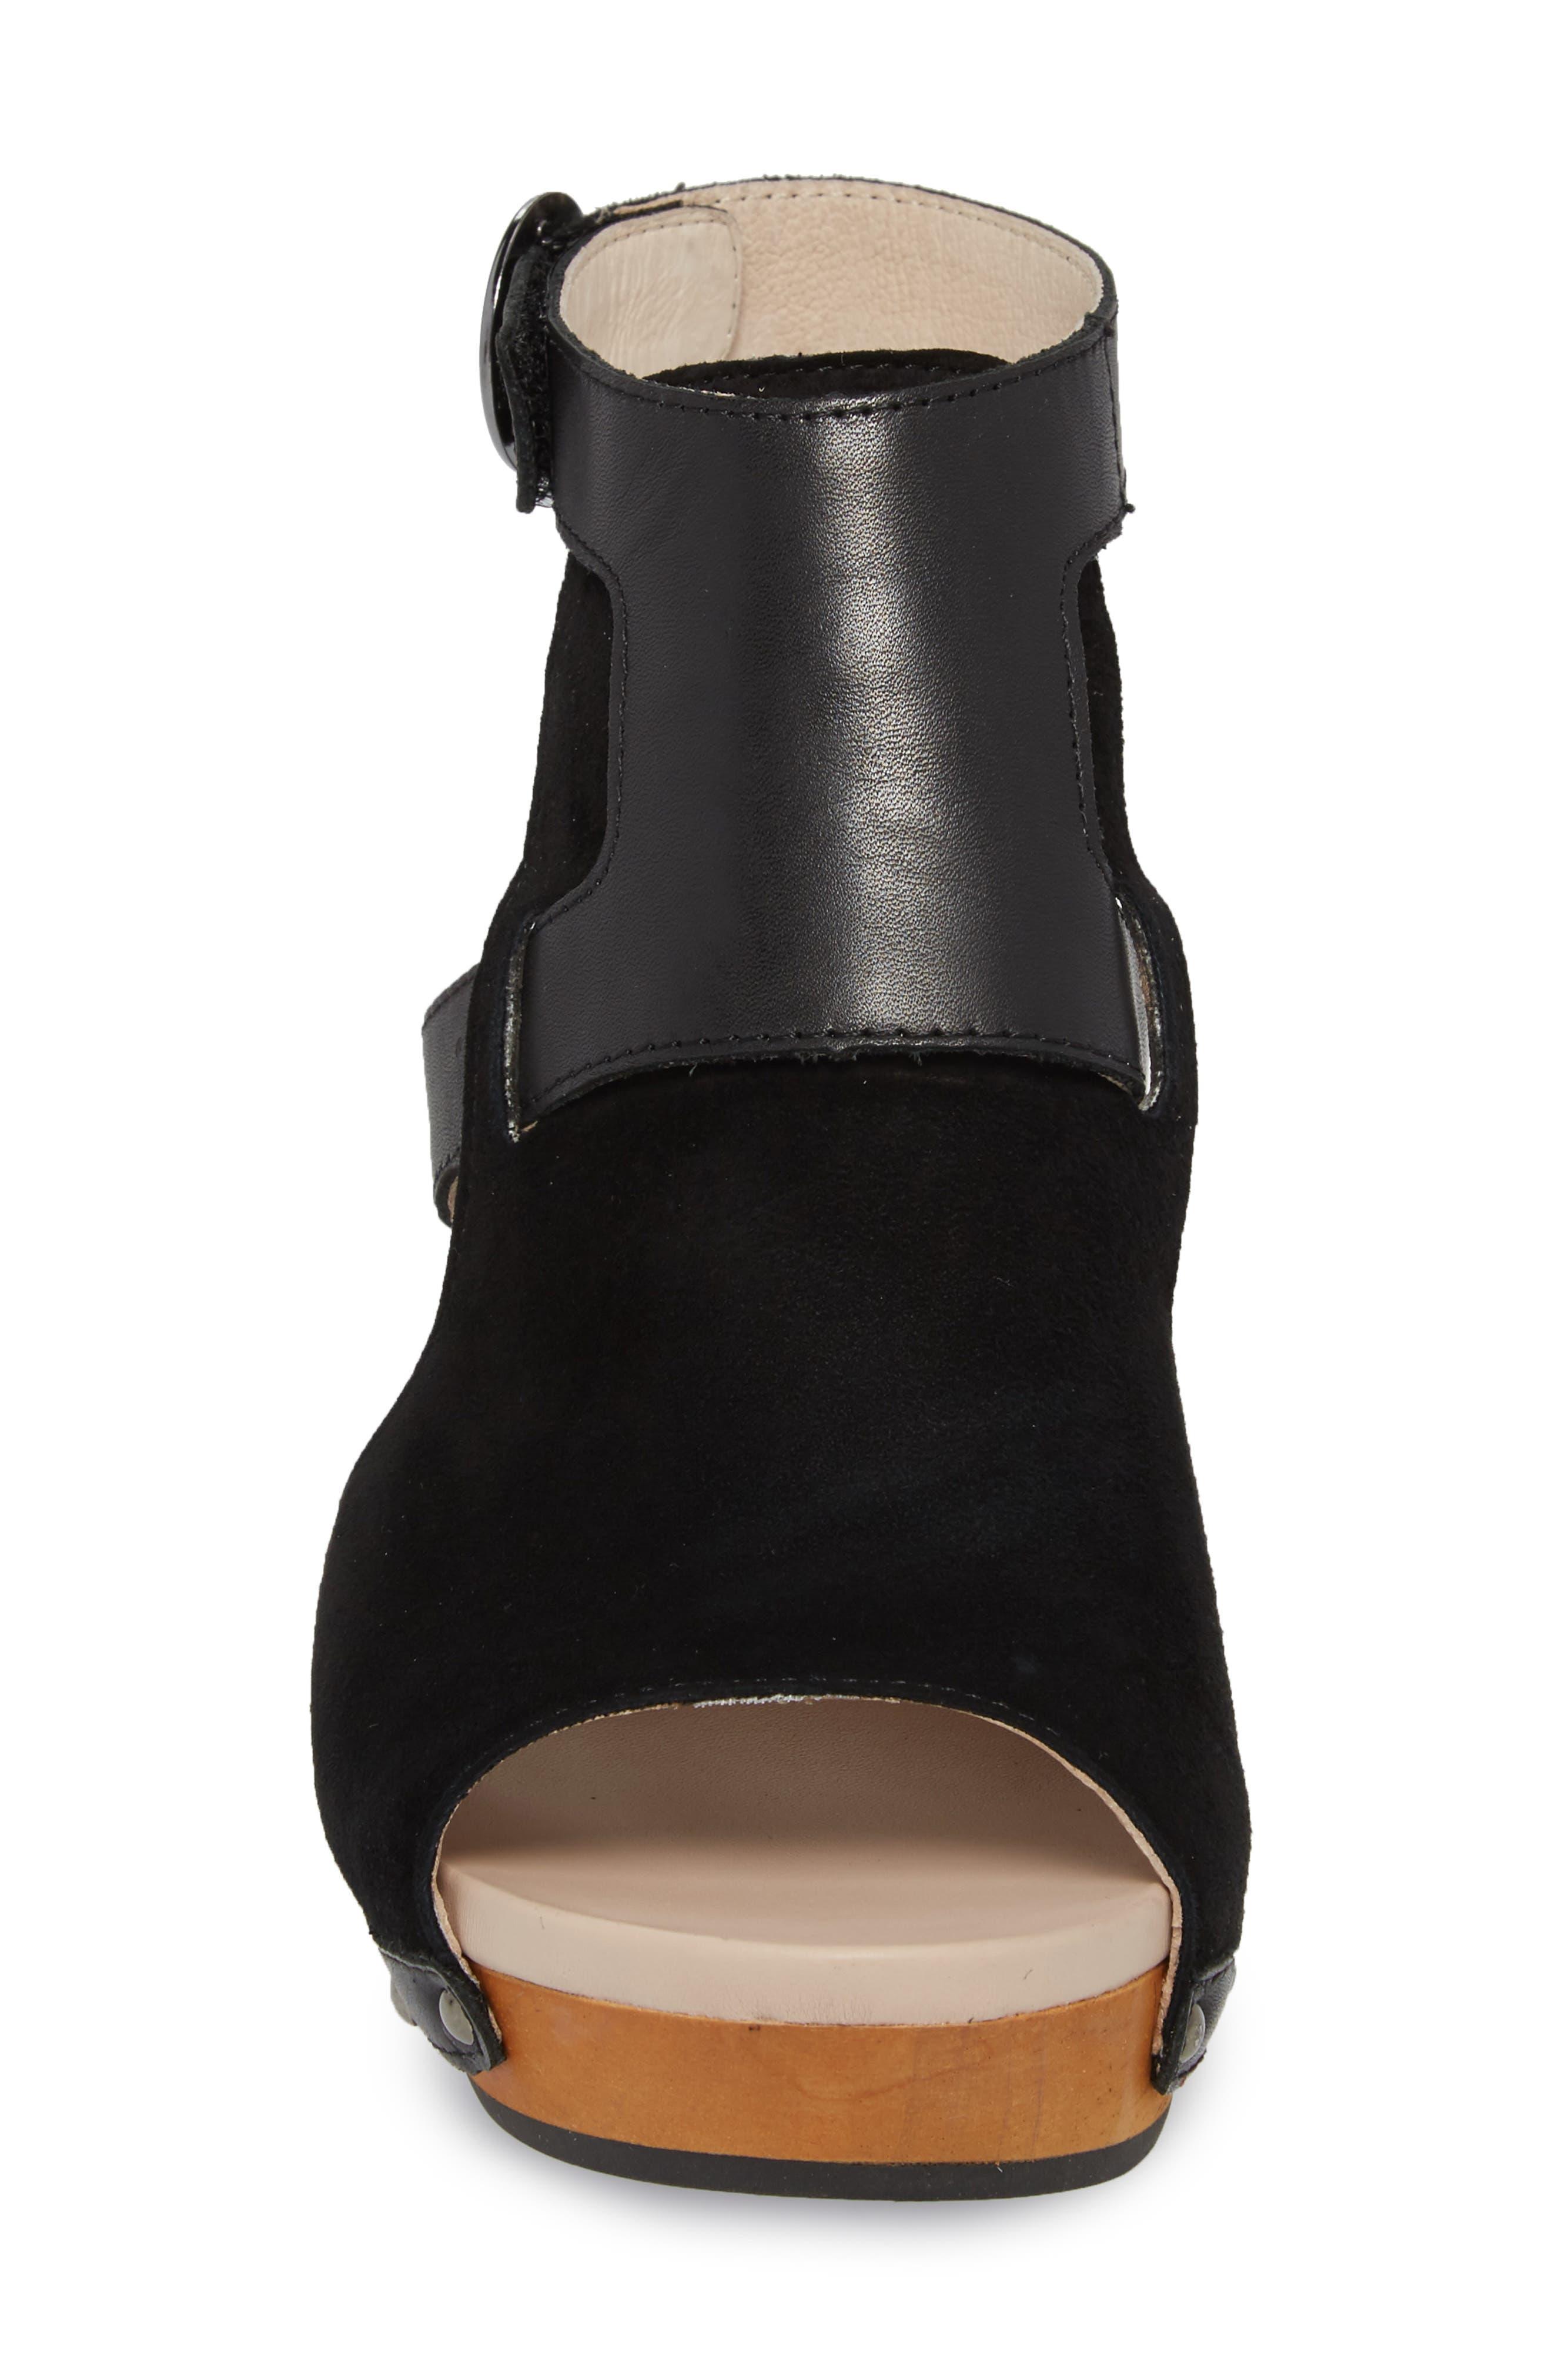 Gina Platform Sandal,                             Alternate thumbnail 4, color,                             BLACK LEATHER